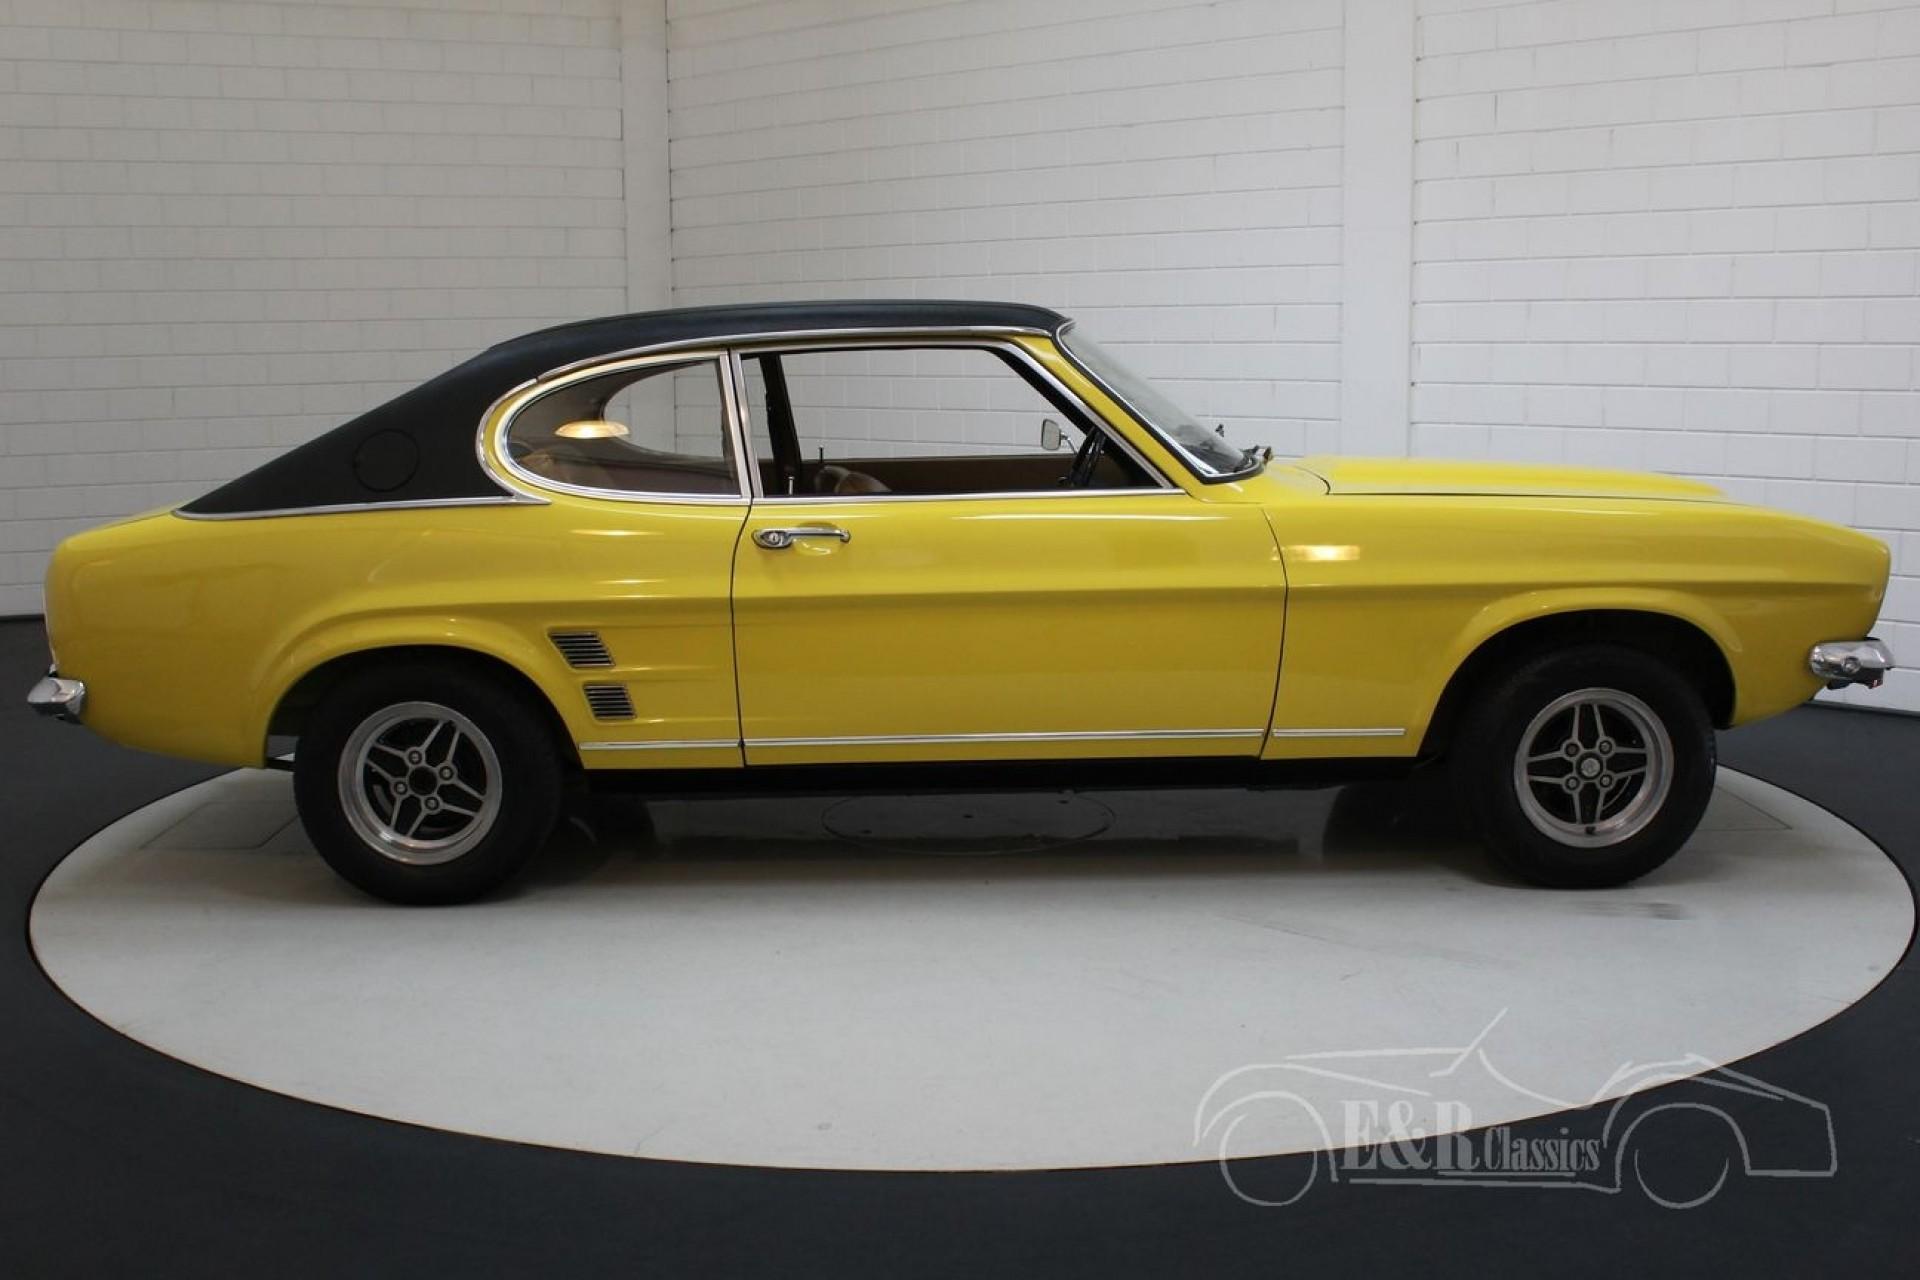 Ford Capri Mk1 1600 Gt 1974 For Sale At Erclassics